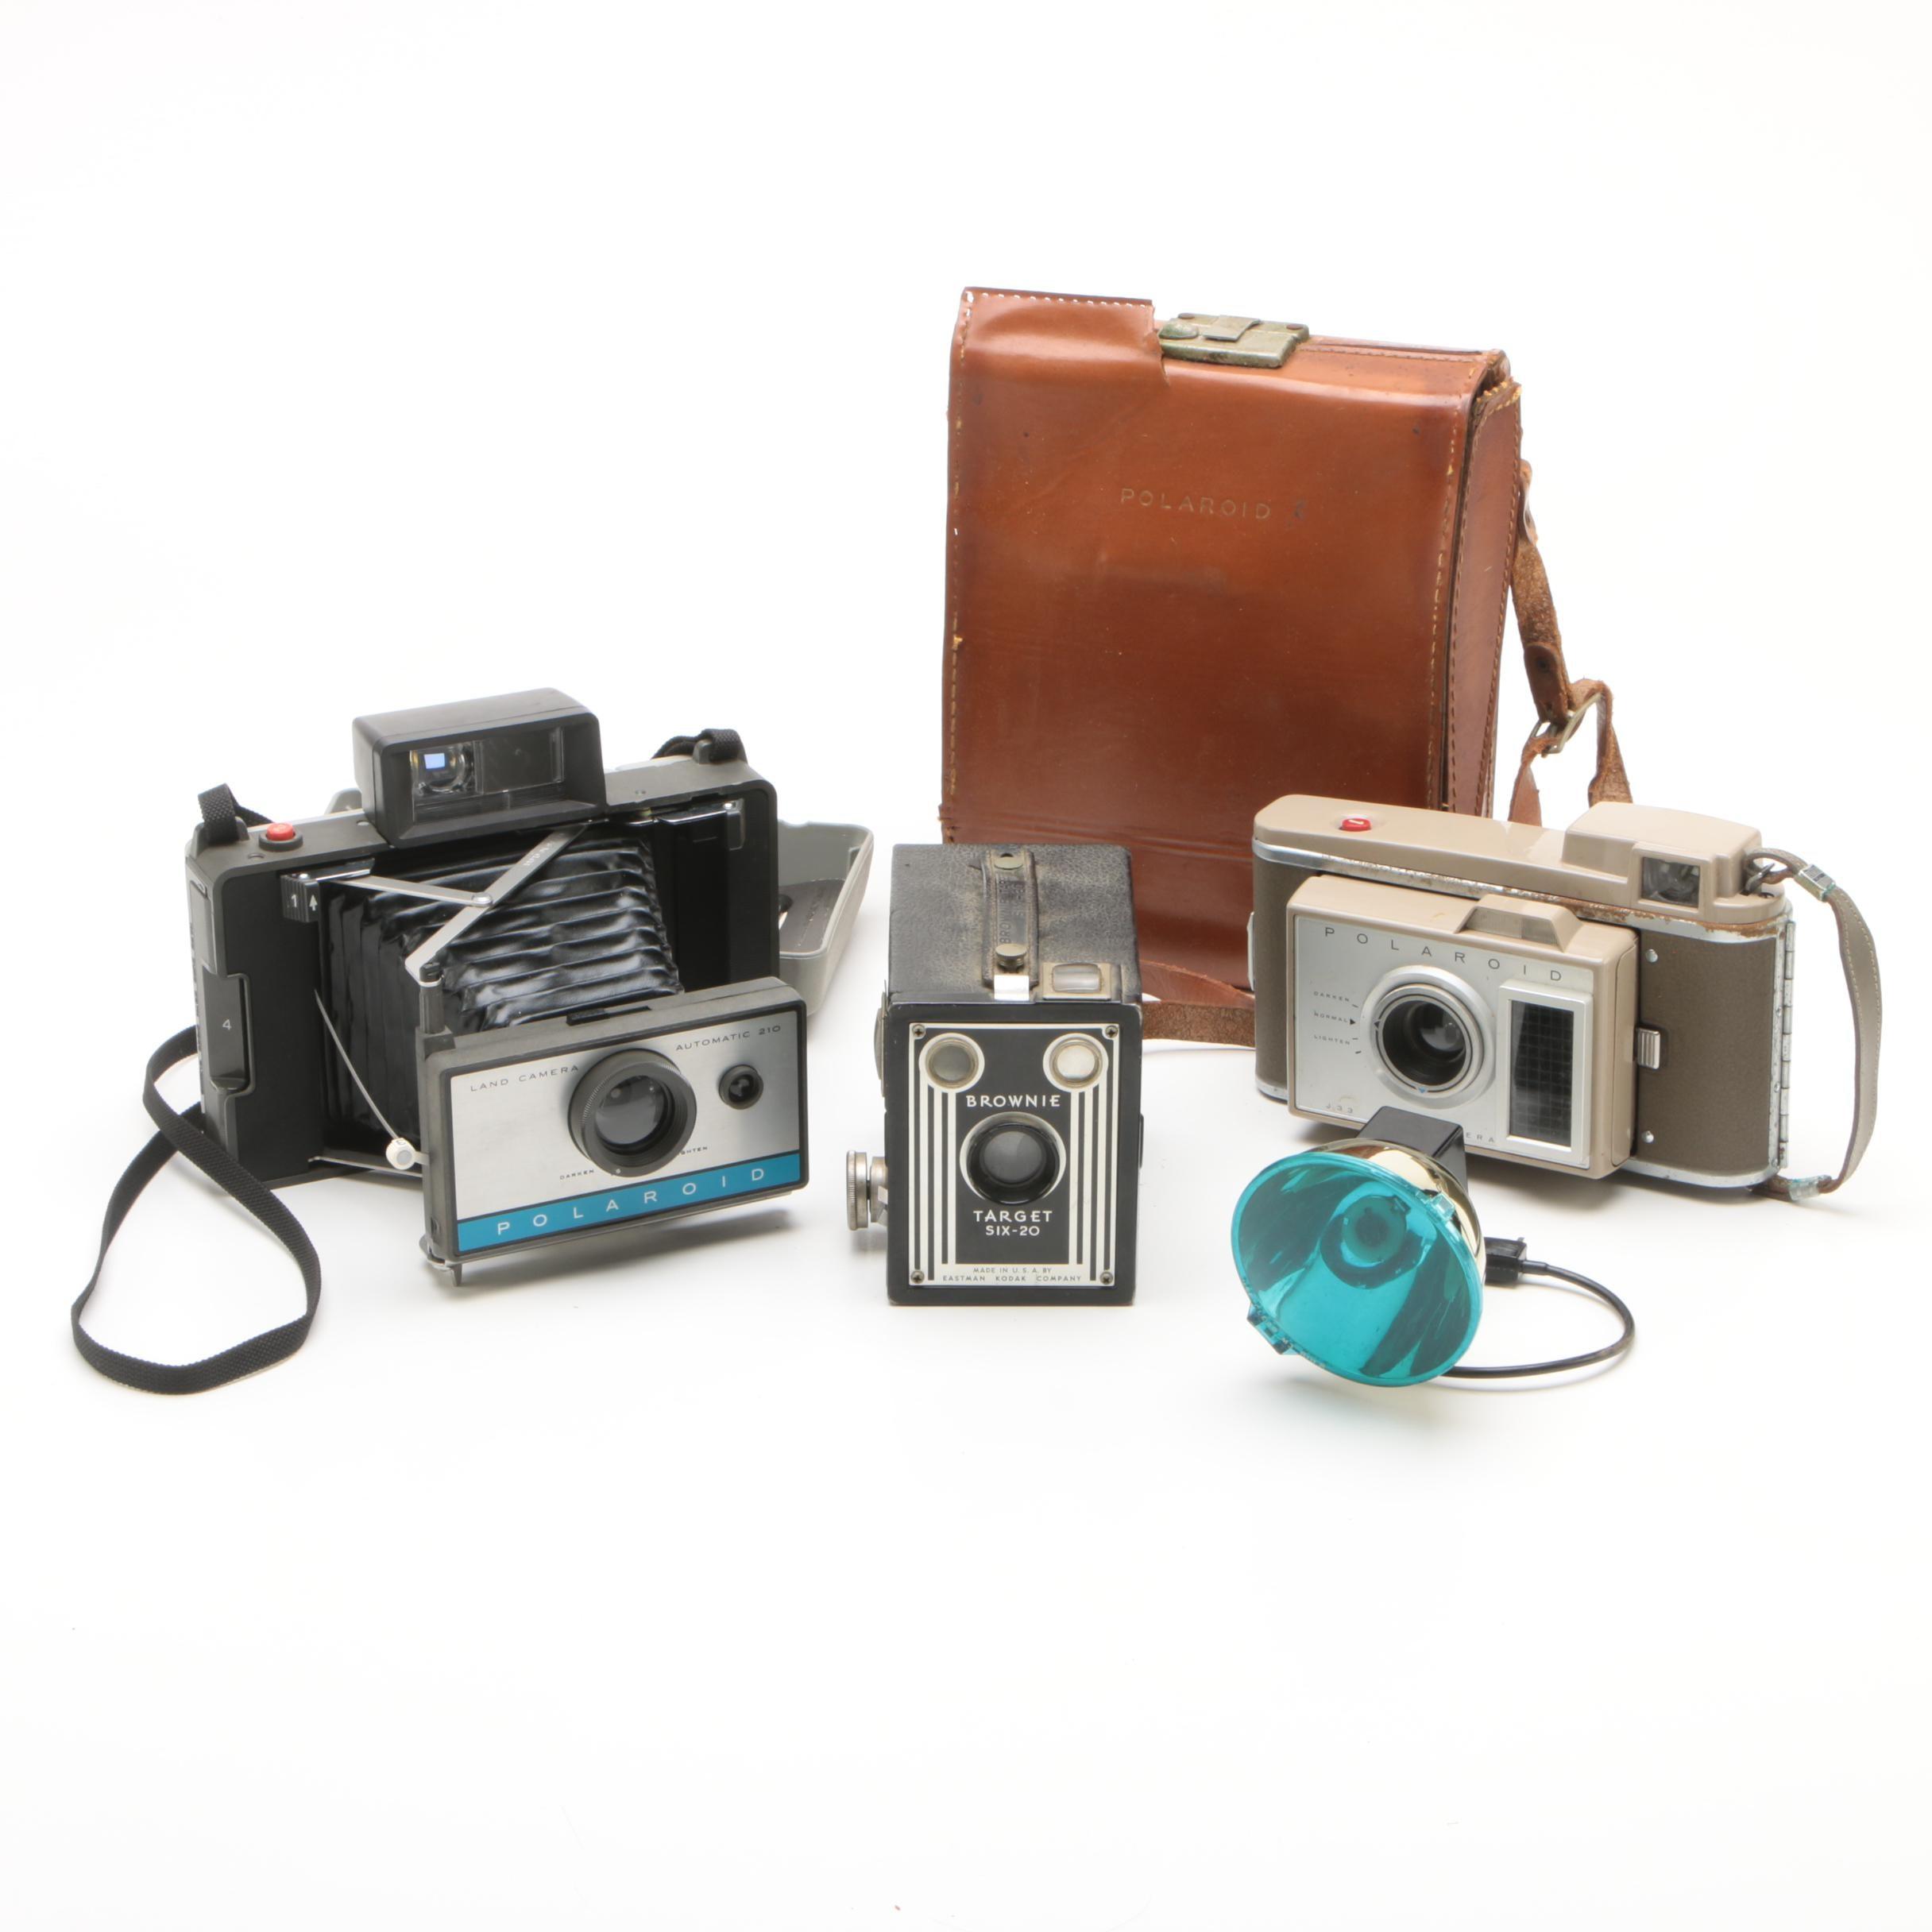 Vintage Polaroid Land Cameras and Accessories with Kodak Brownie Box Camera